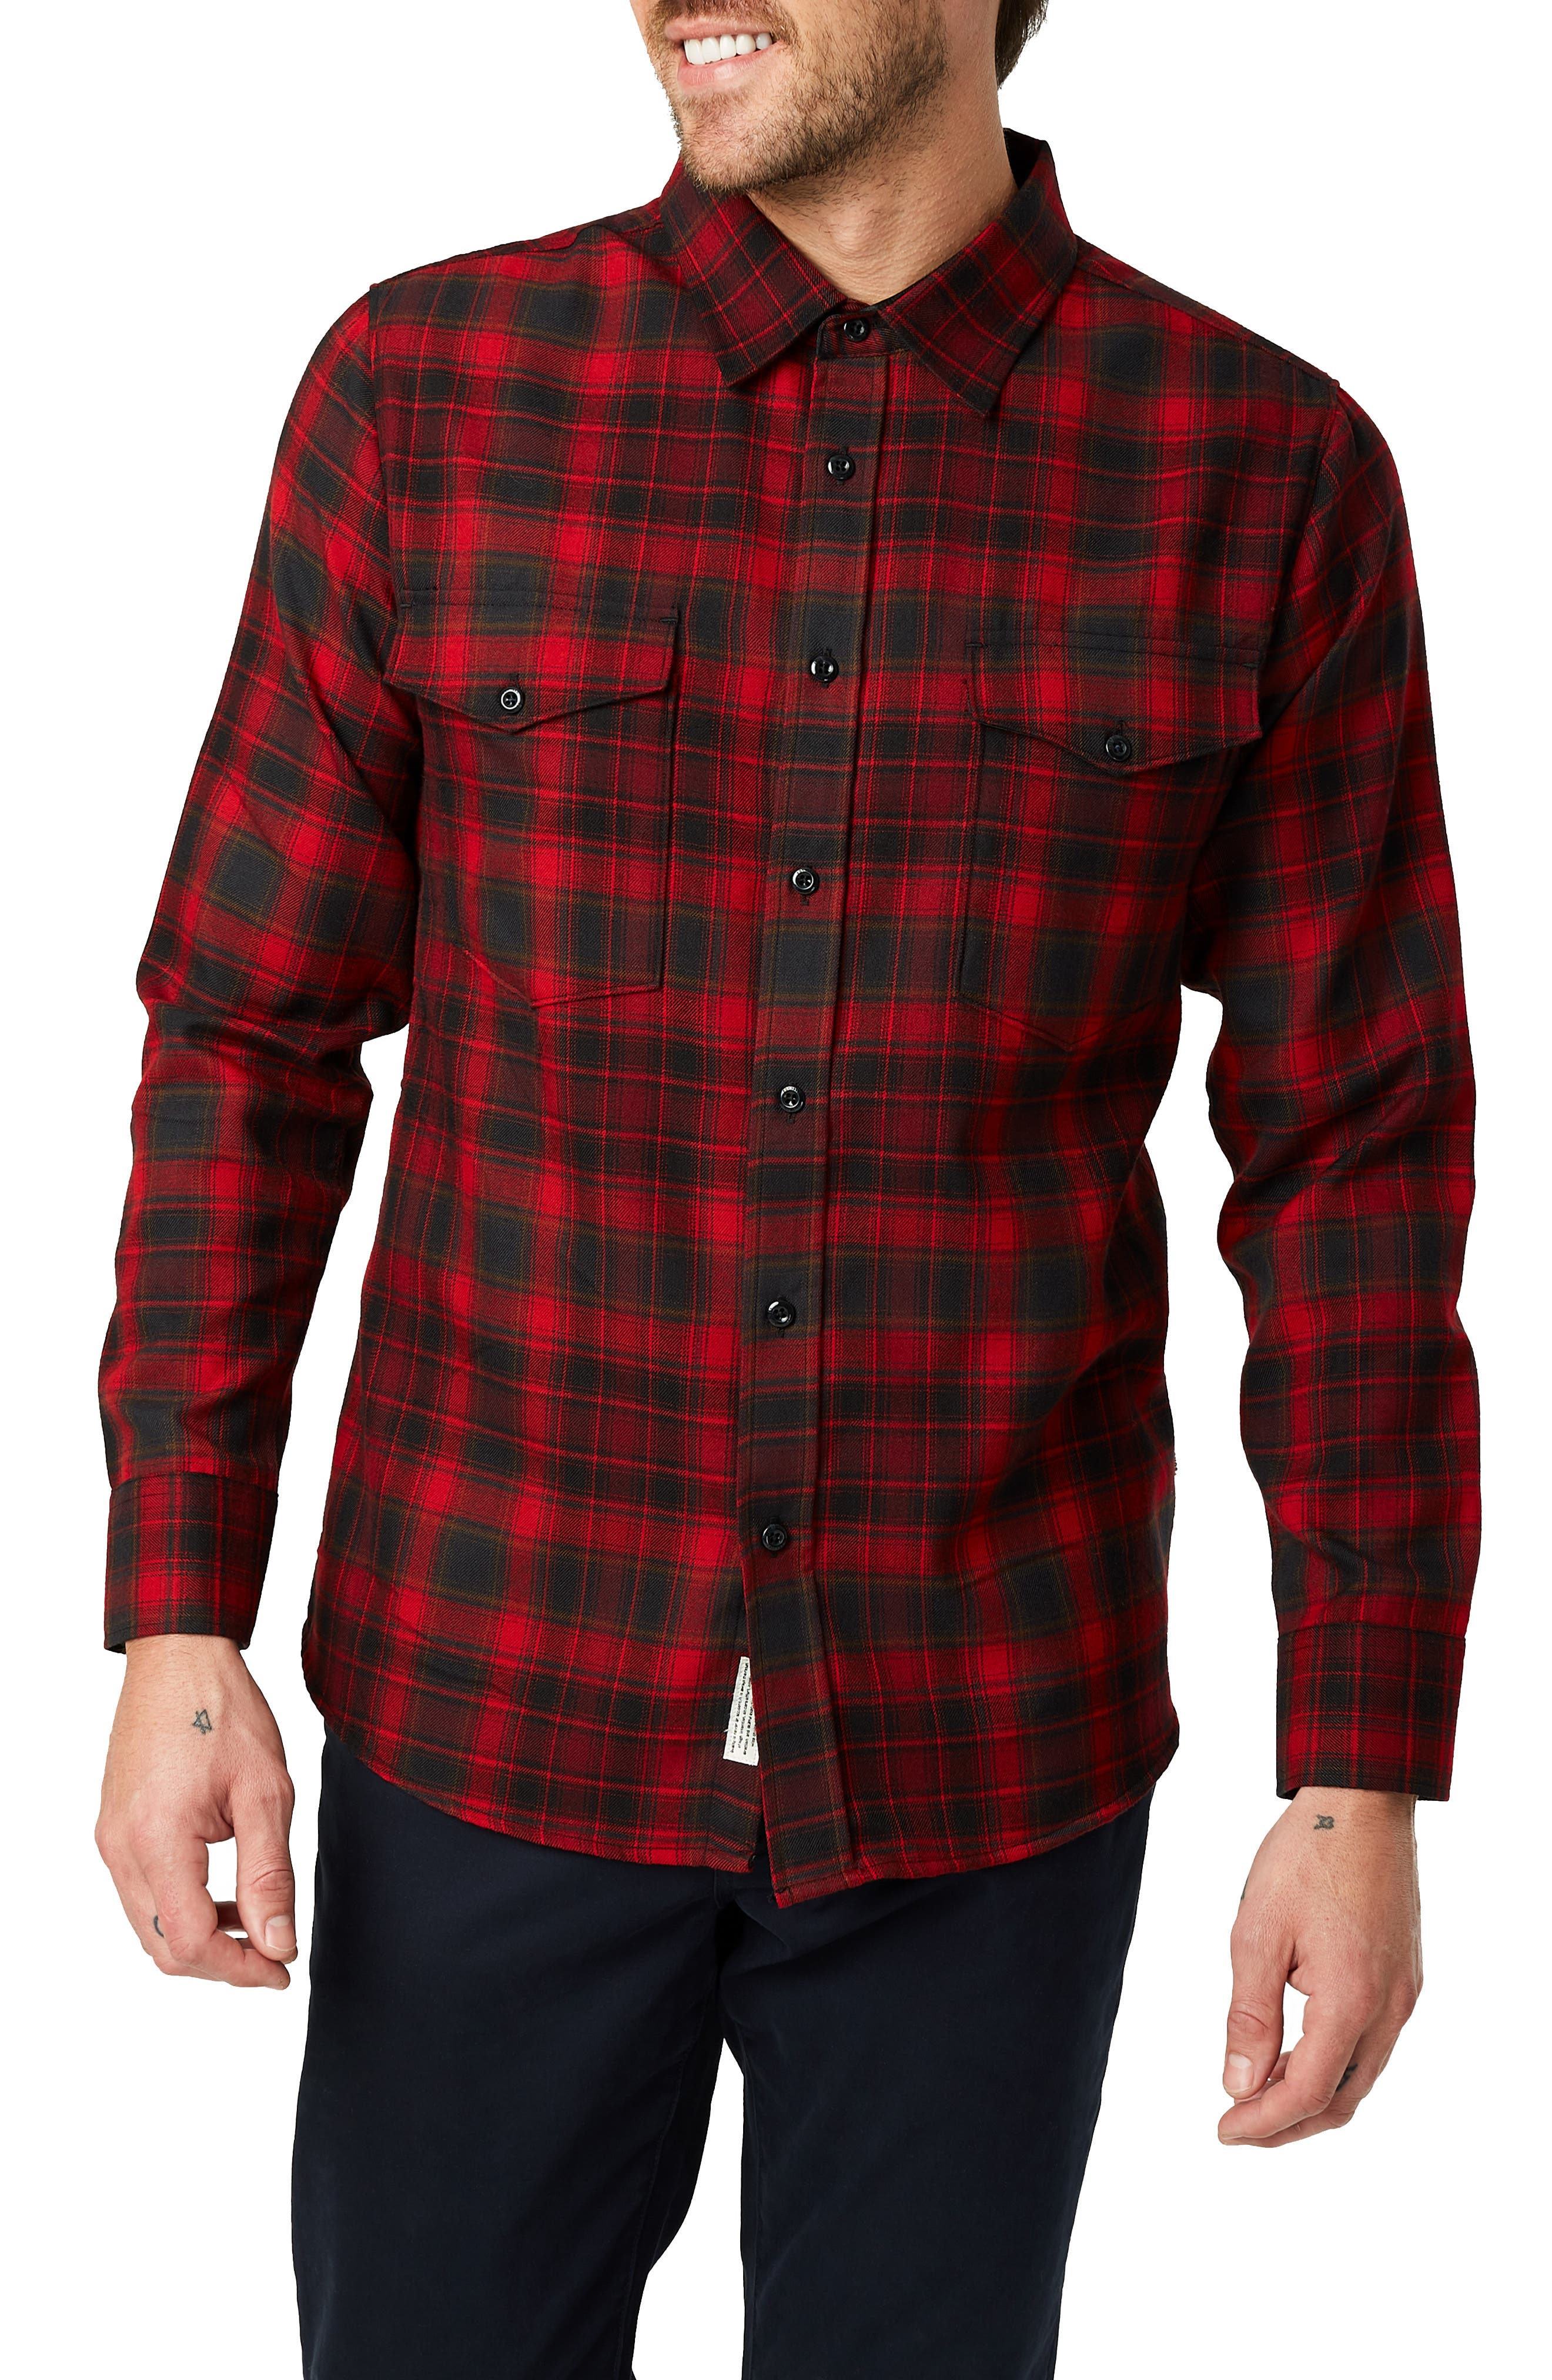 Image of 7 Diamonds Spruce Slim Fit Plaid Flannel Shirt